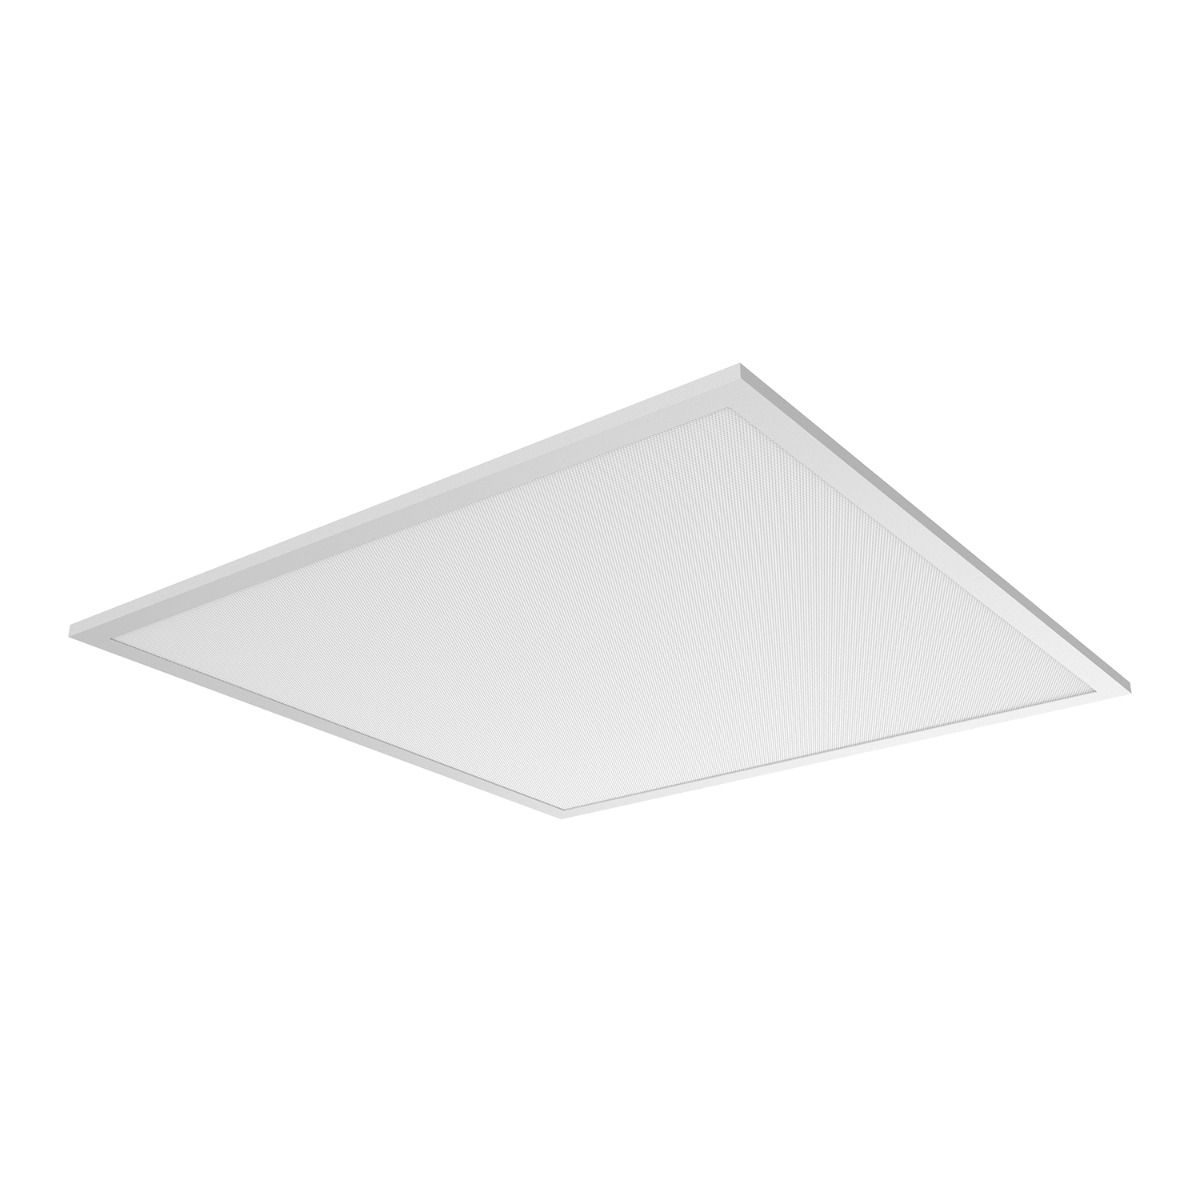 Noxion LED Panel Delta Pro V3 Highlum DALI 36W 3000K 5225lm 60x60cm UGR <19 | Warm White - Replaces 4x18W